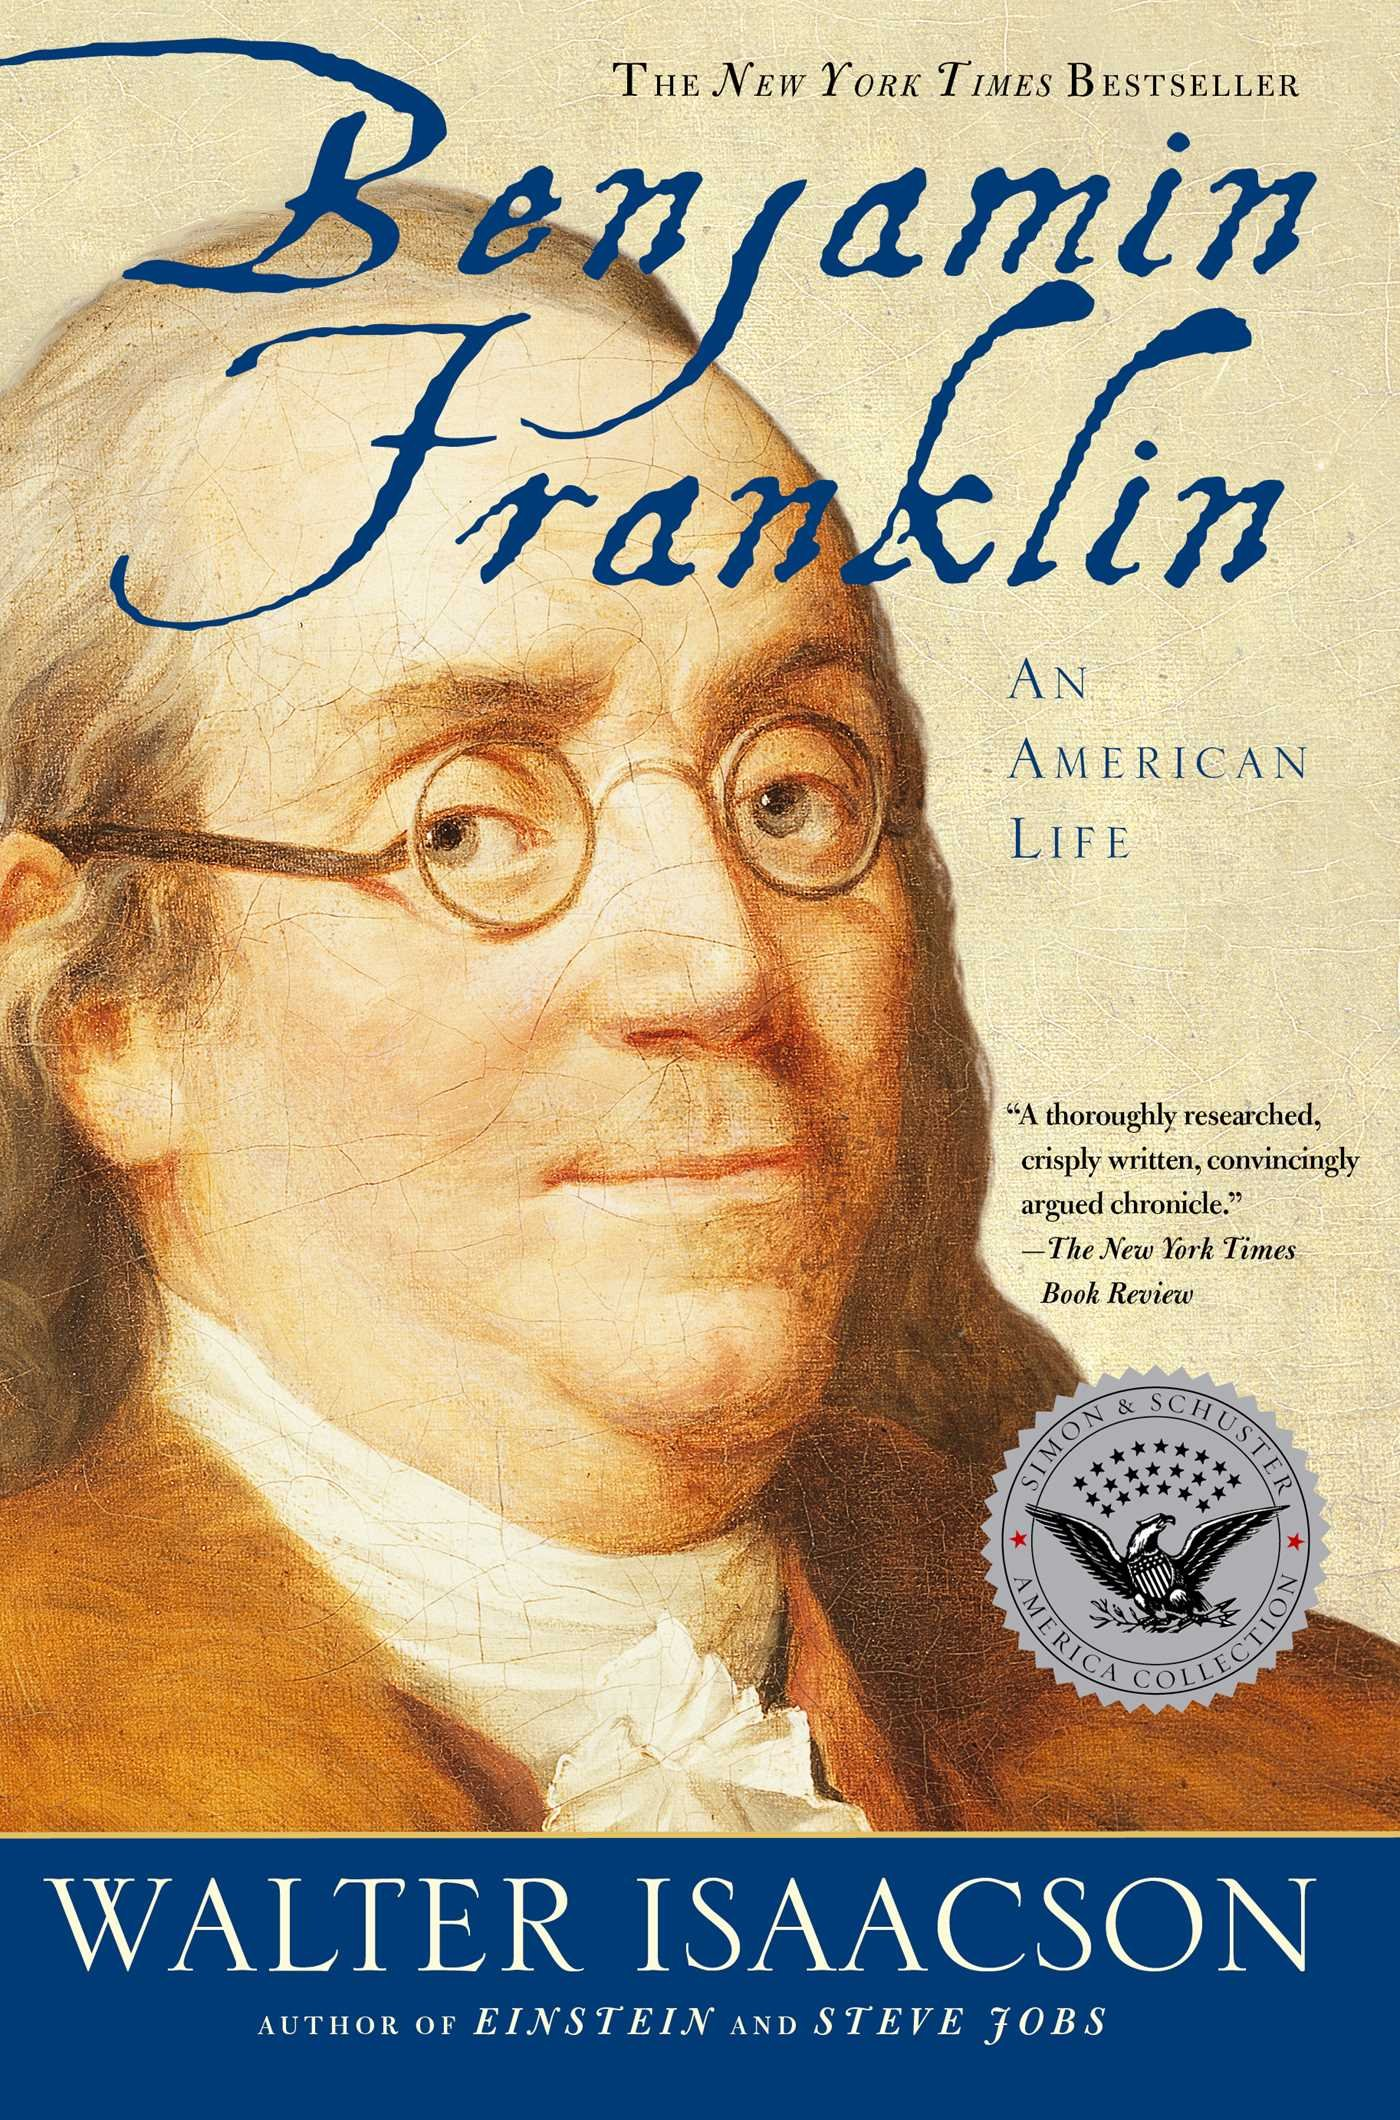 Amazon.com: Benjamin Franklin: An American Life eBook: Isaacson, Walter:  Kindle Store